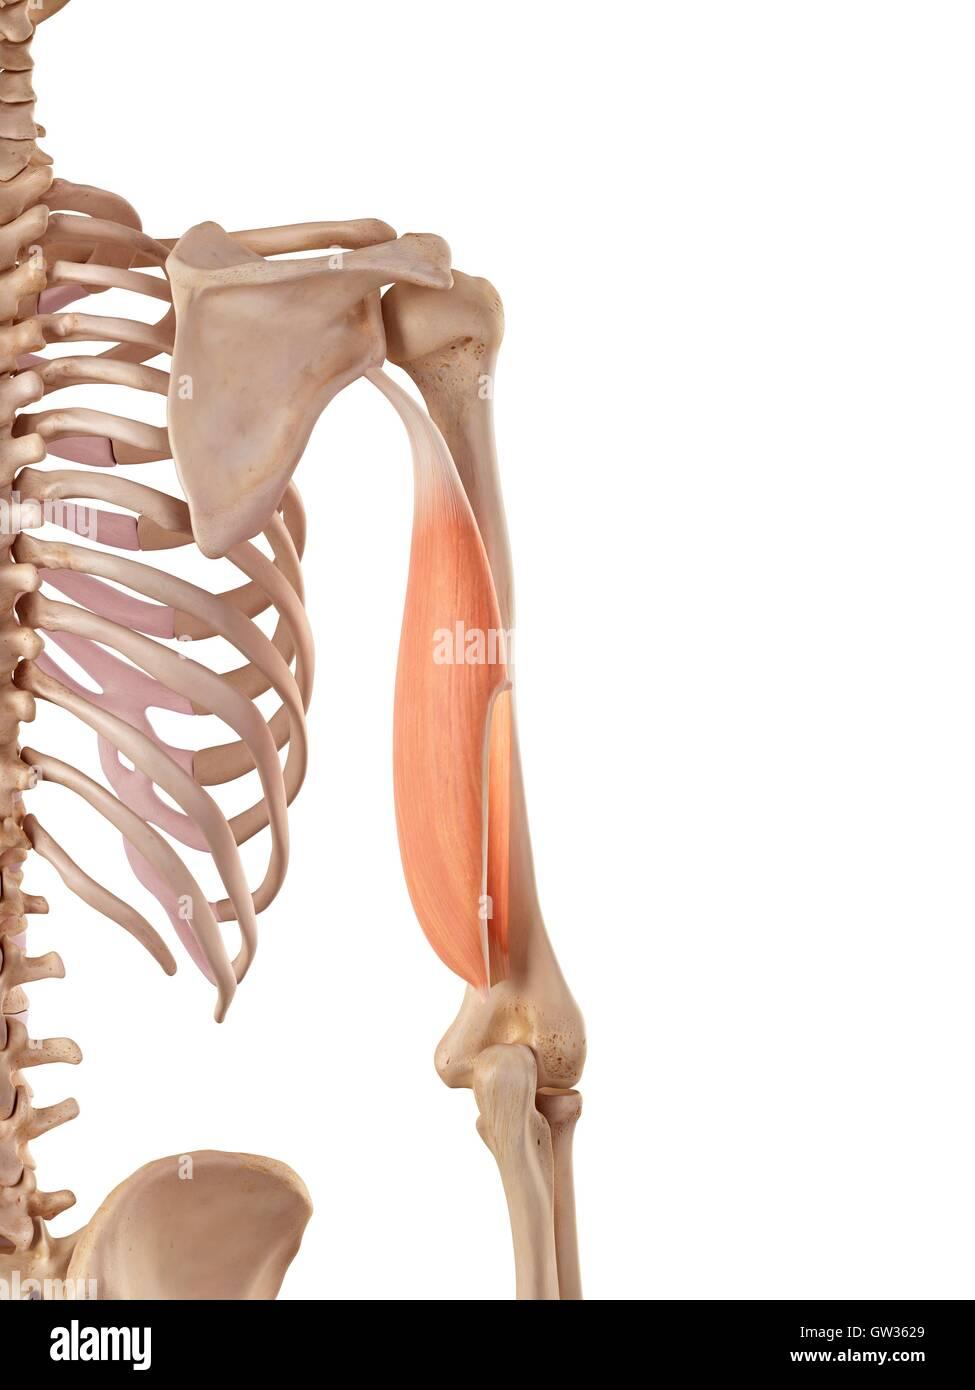 Human triceps, illustration Stock Photo: 118699233 - Alamy